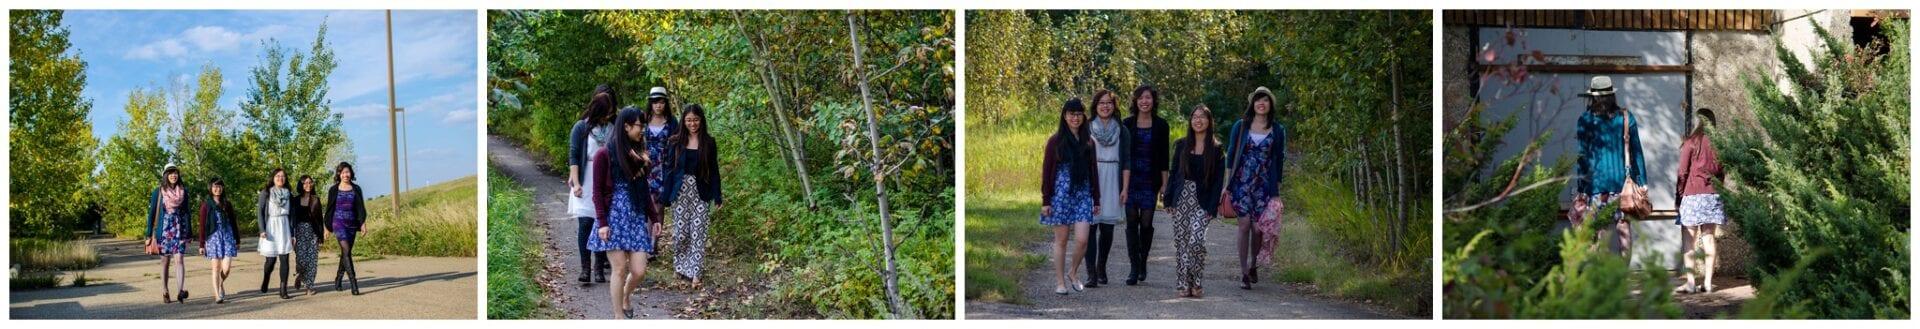 Sherwood Park Edmonton-scenery-forest-nature-mpstudio-000